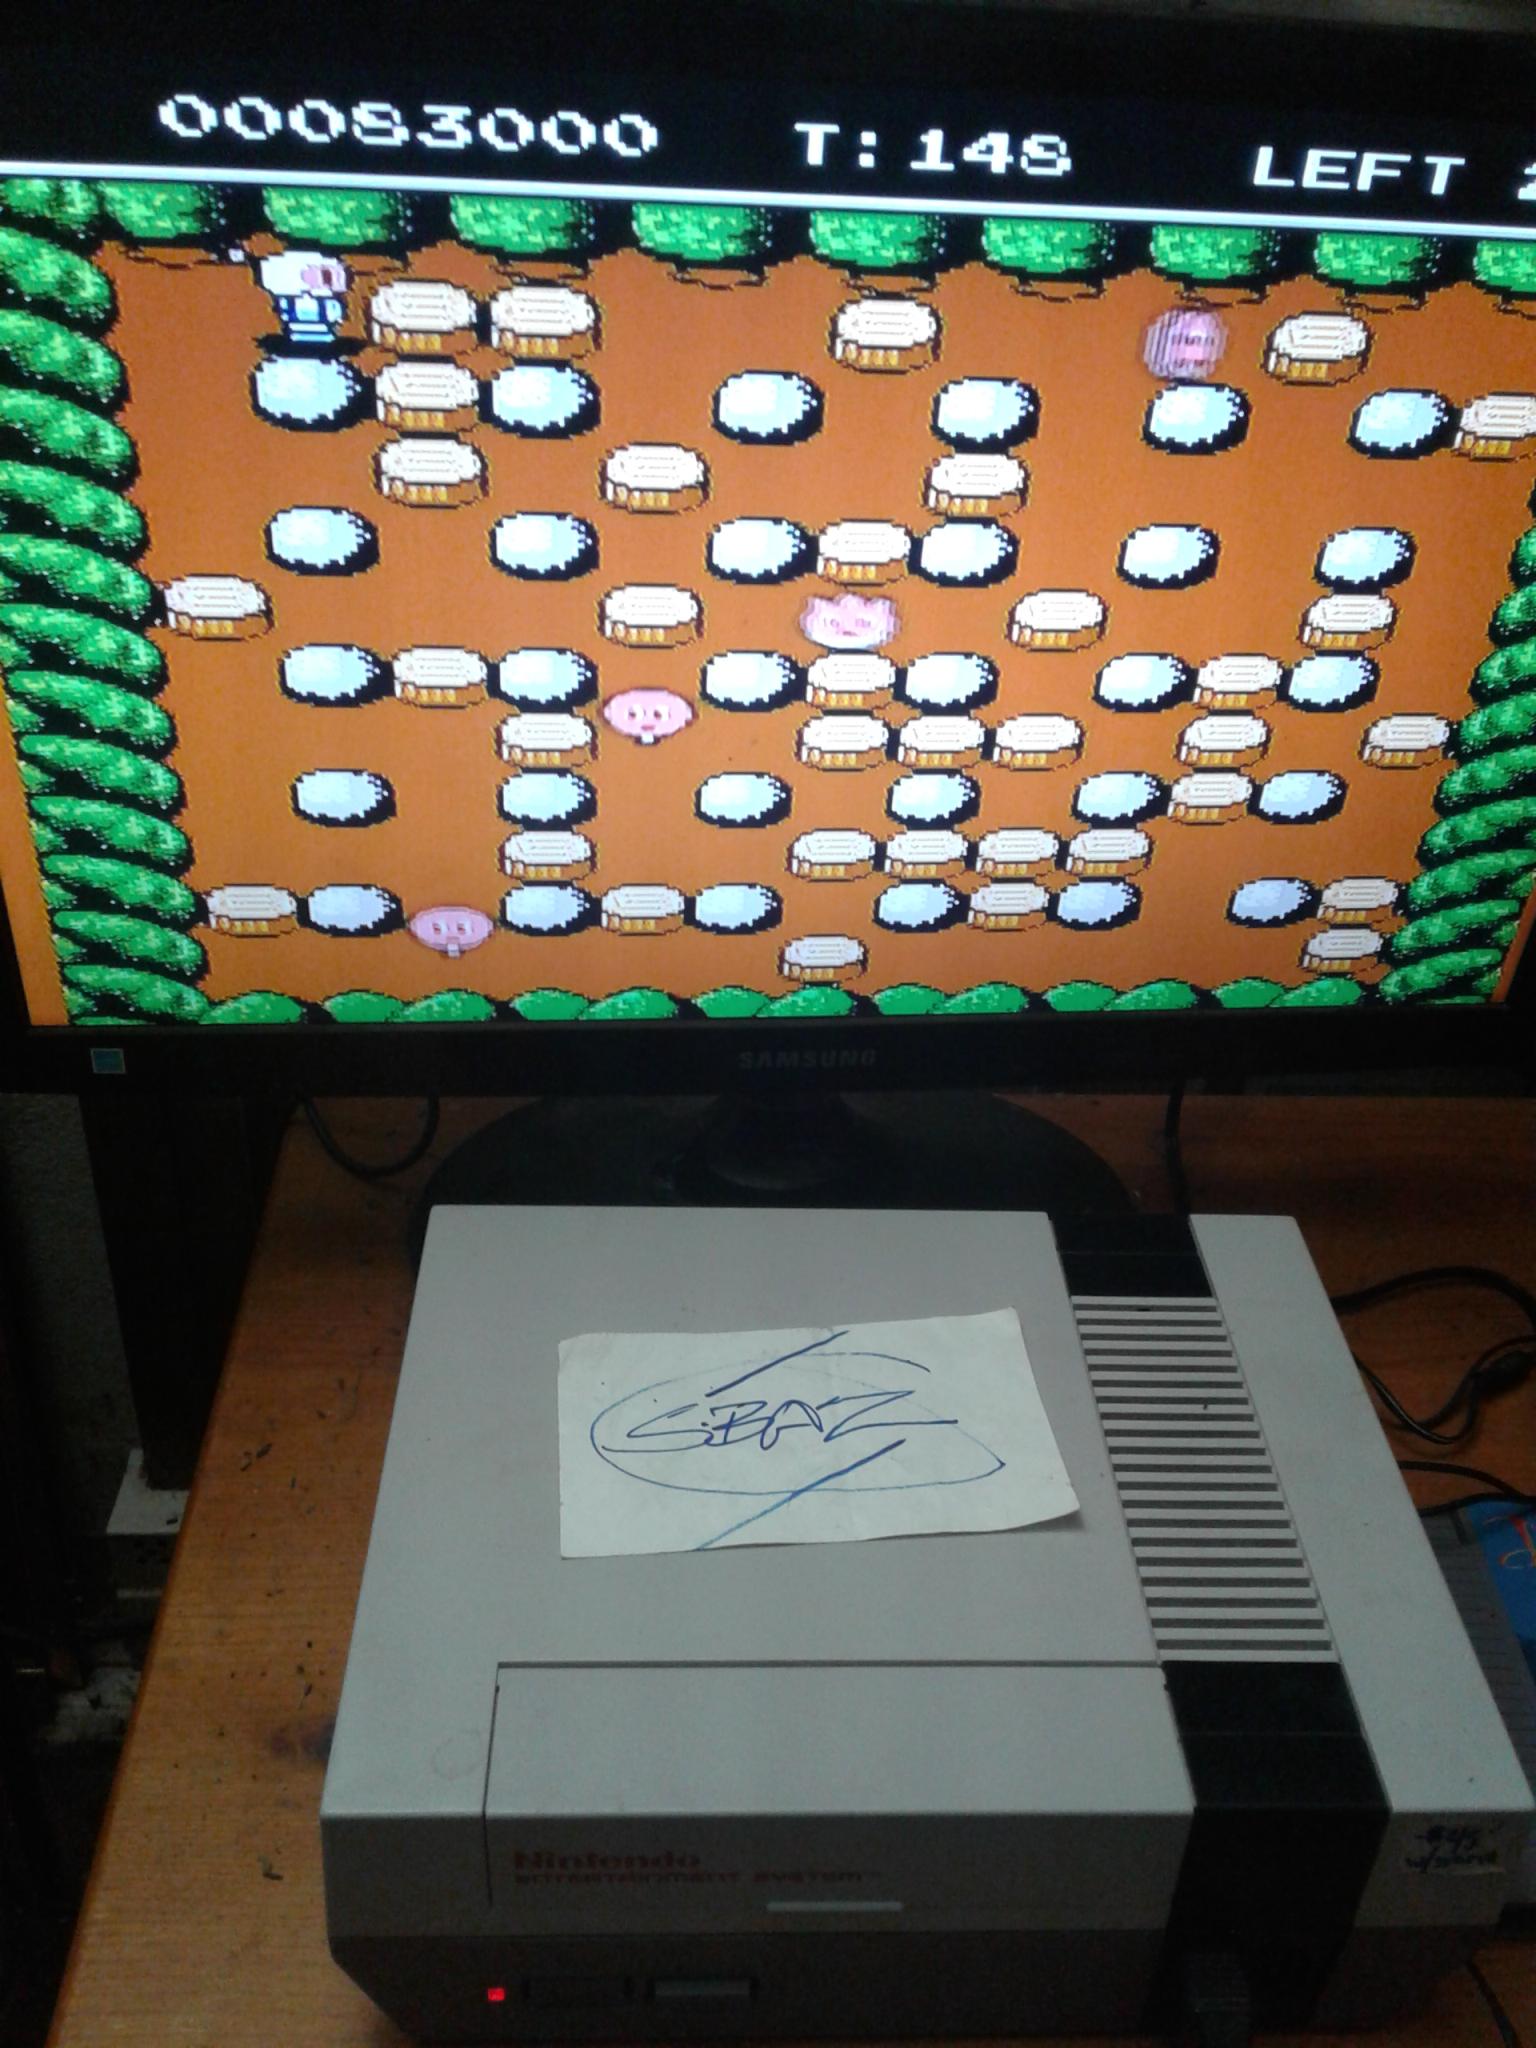 S.BAZ: Bomberman II [Normal Mode] (NES/Famicom) 83,000 points on 2019-11-27 22:07:07